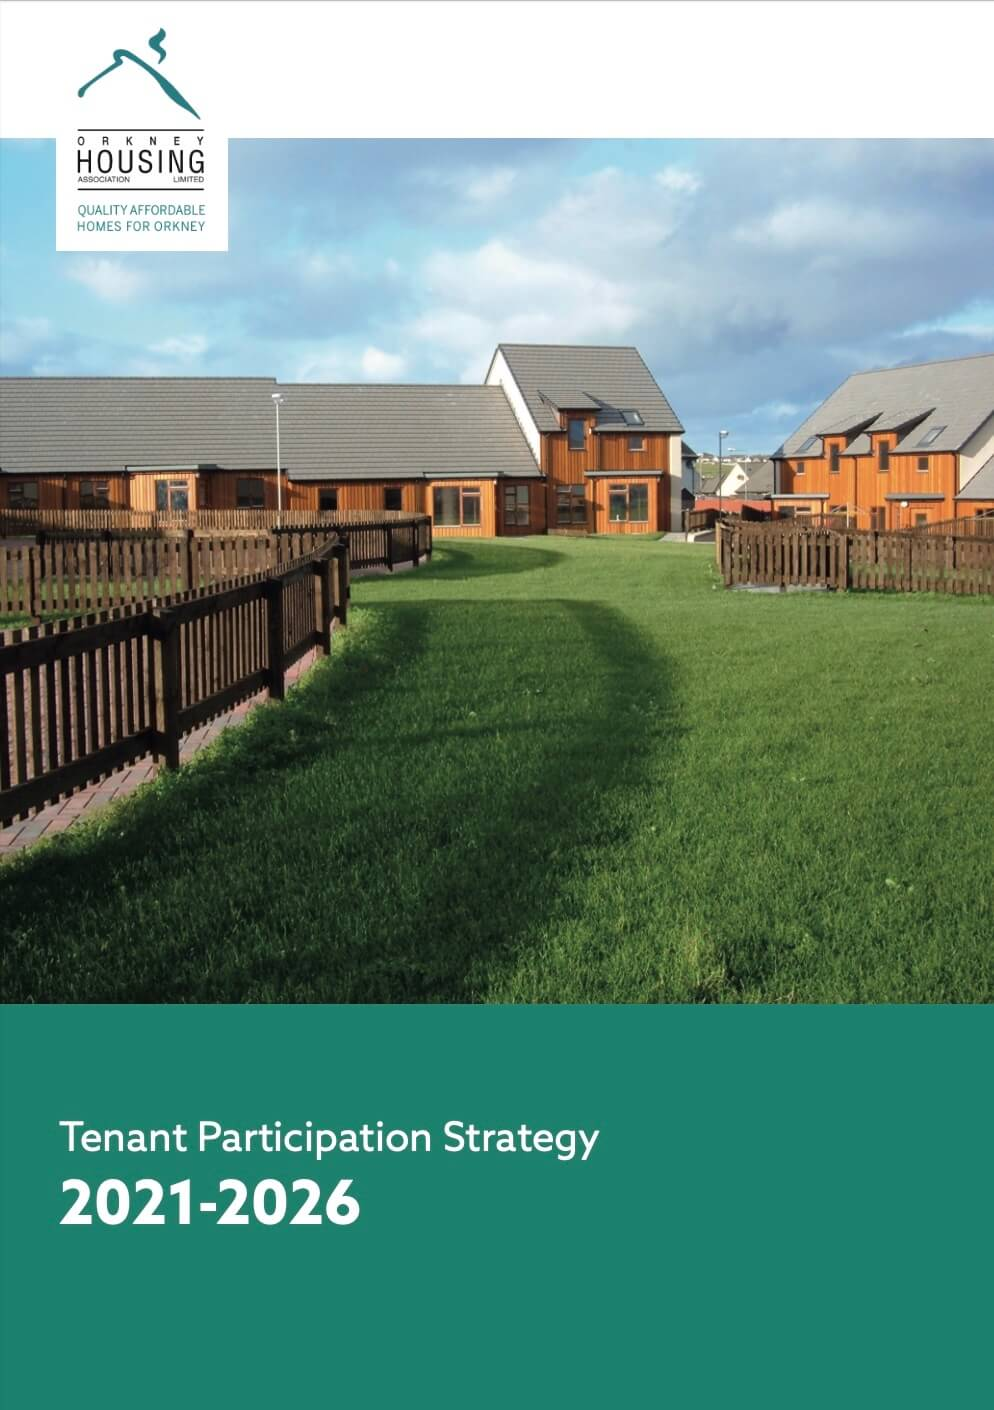 Tenant Participation Strategy 2021-2026